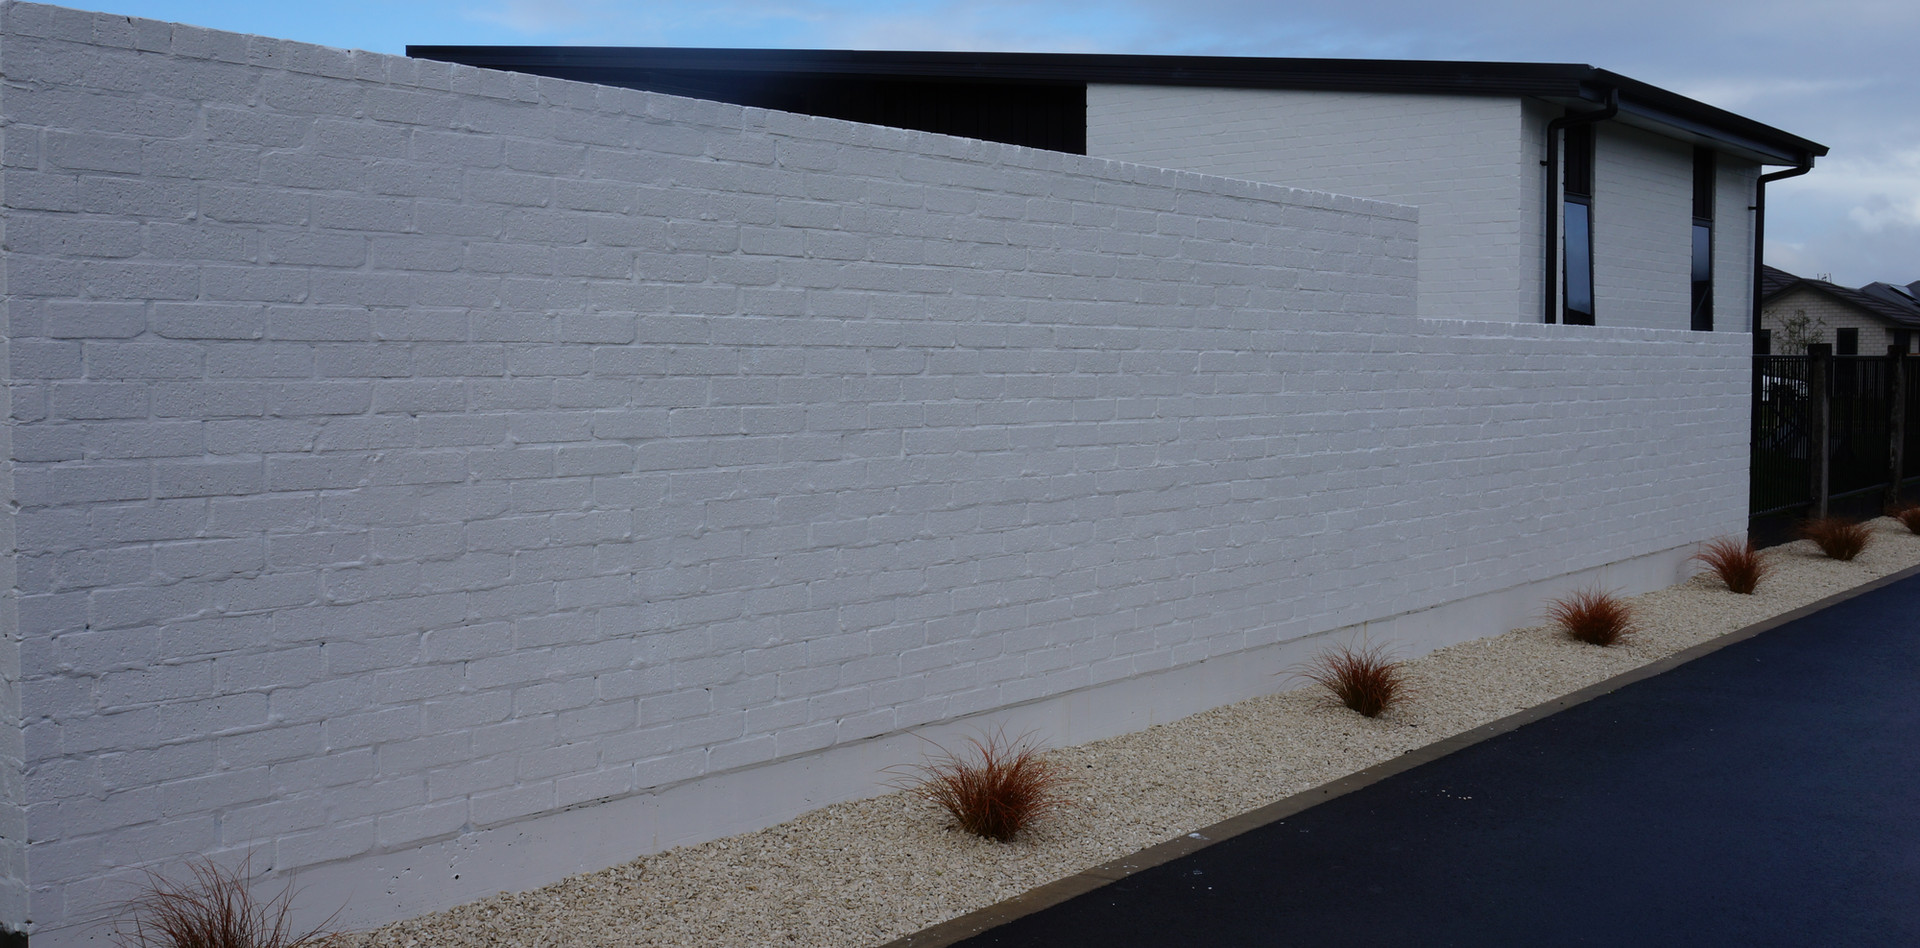 Rumbled single brick